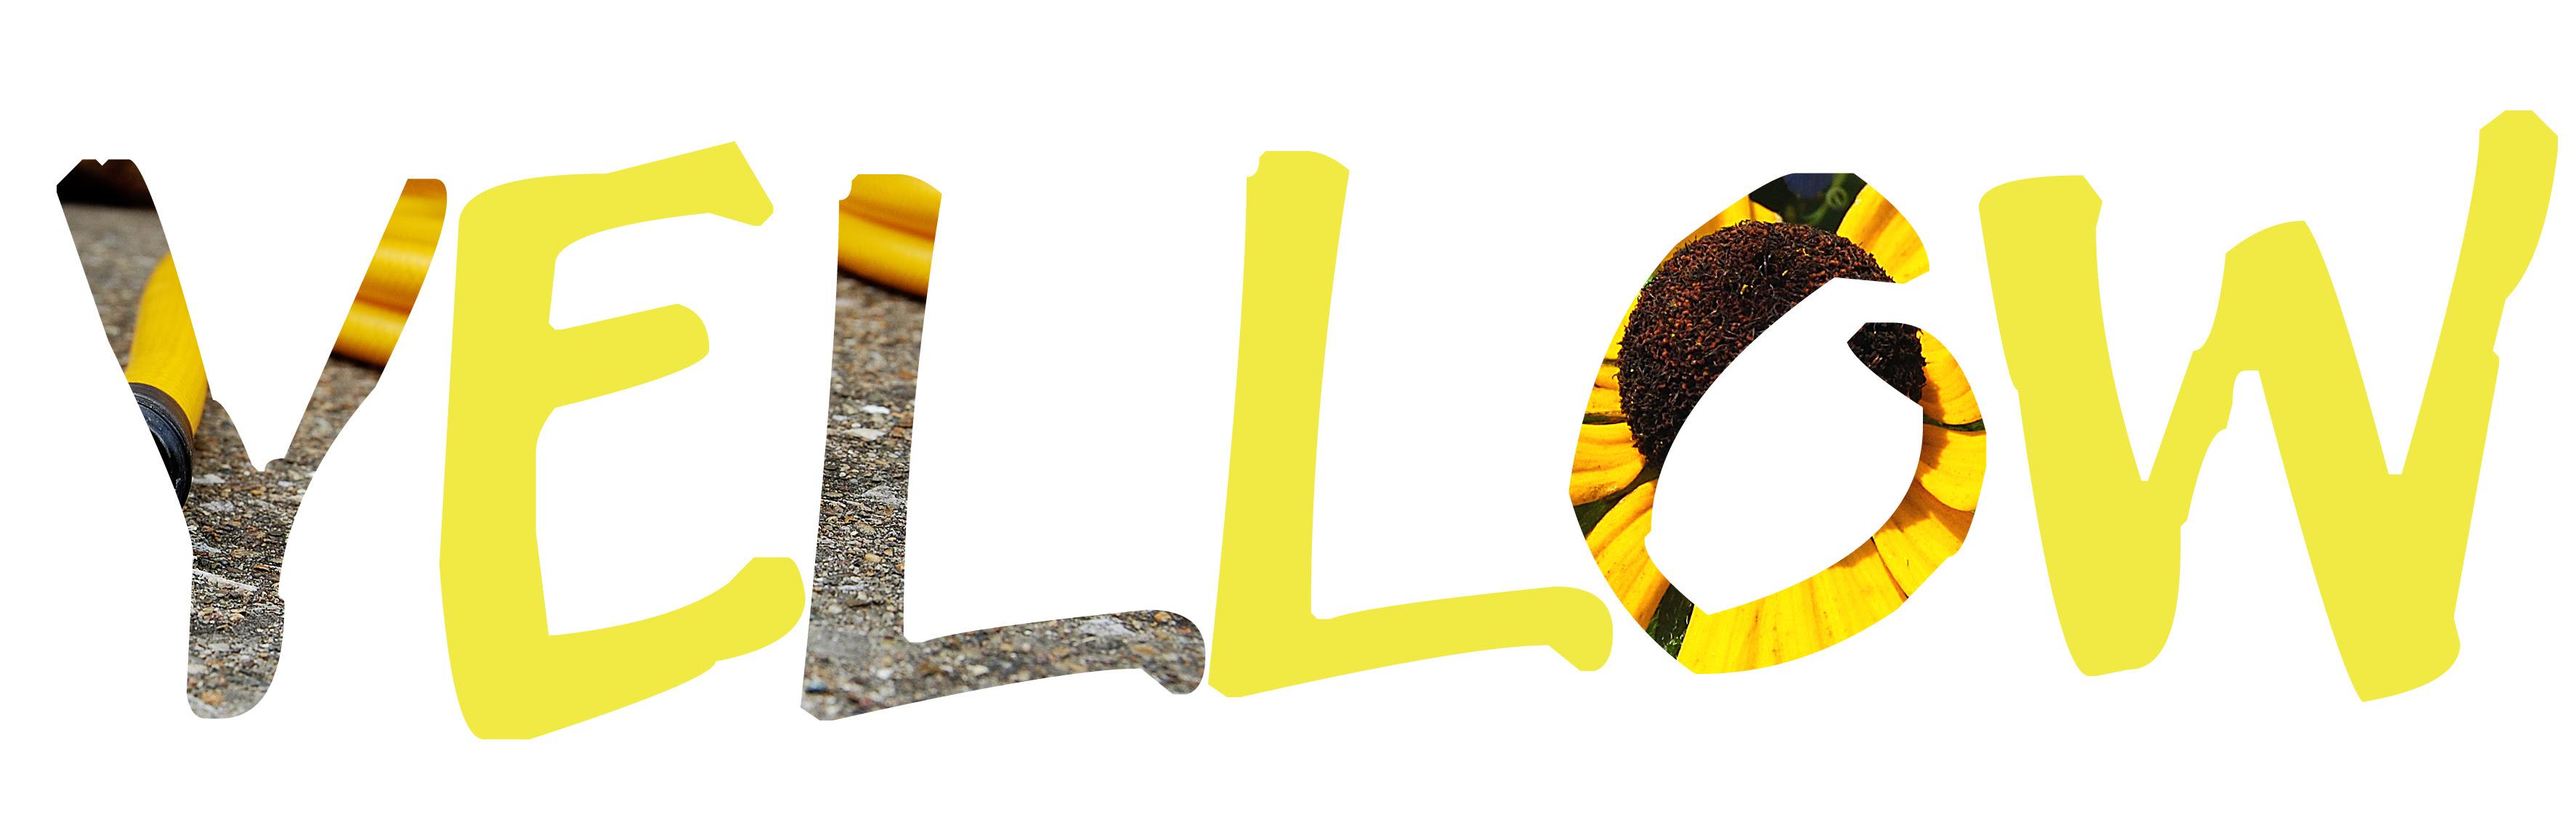 Crazy Days of Summer Week 4: Yellow